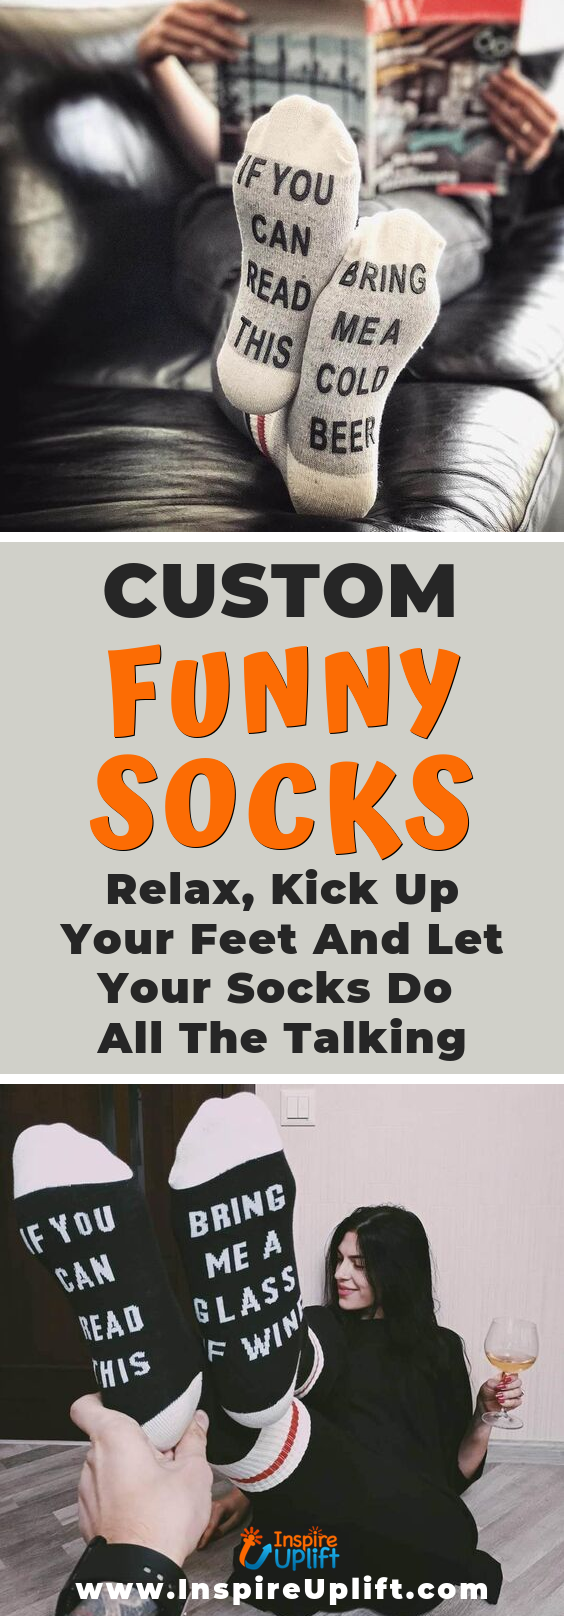 Custom Funny Socks 😍 InspireUplift.com